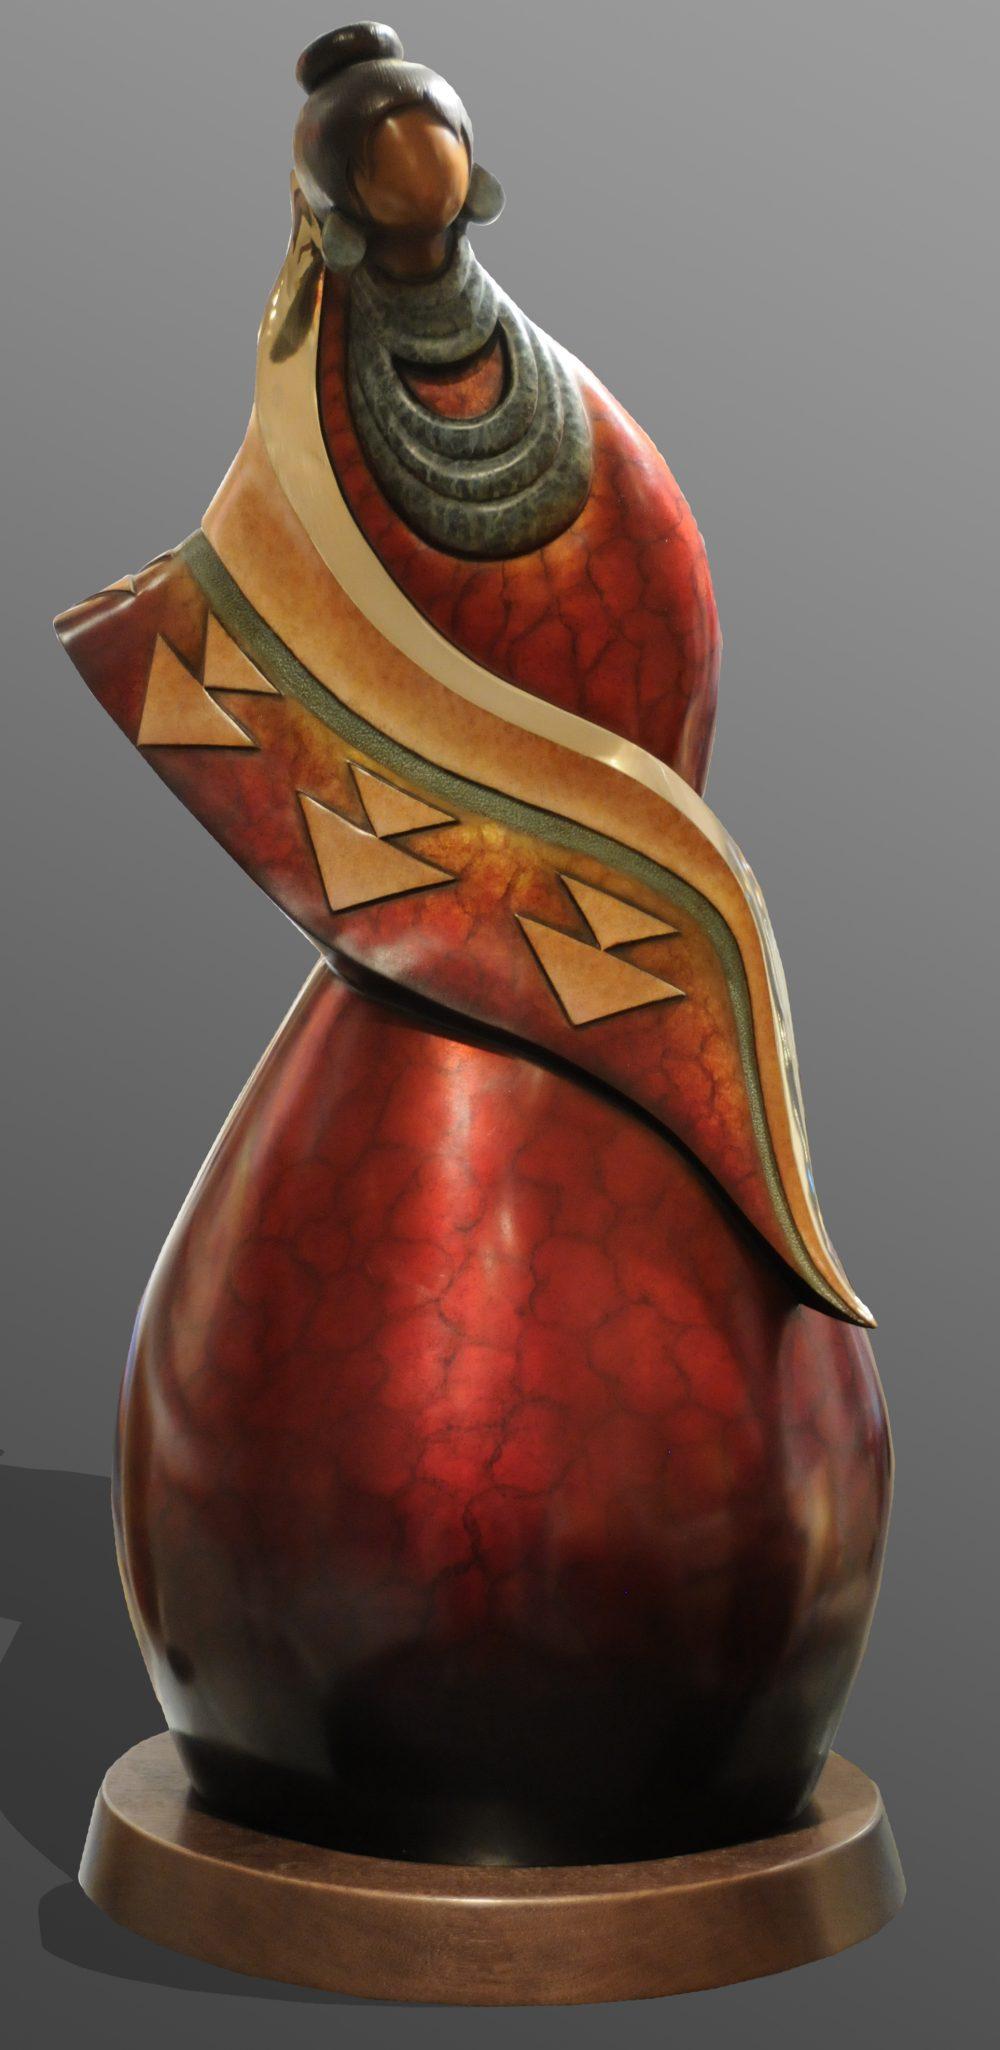 Matriarch | Kim Obrzut | Sculpture-Exposures International Gallery of Fine Art - Sedona AZ